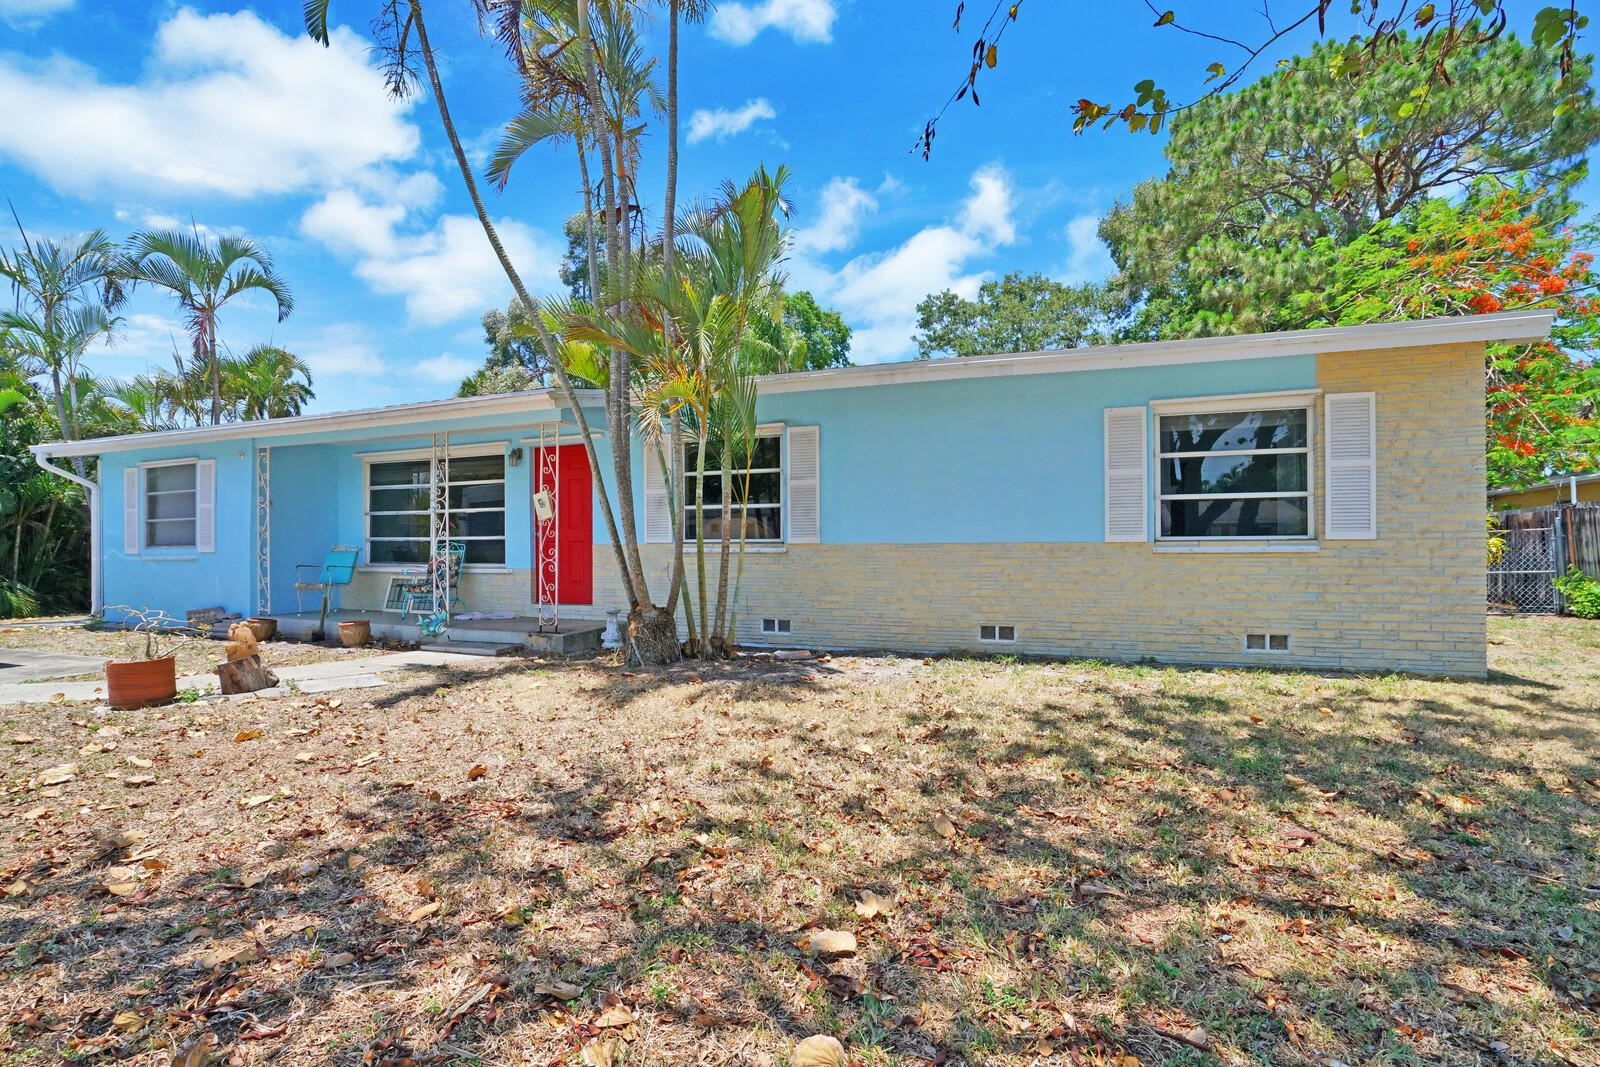 3181 Riddle Road, West Palm Beach, FL 33406 - #: RX-10720970